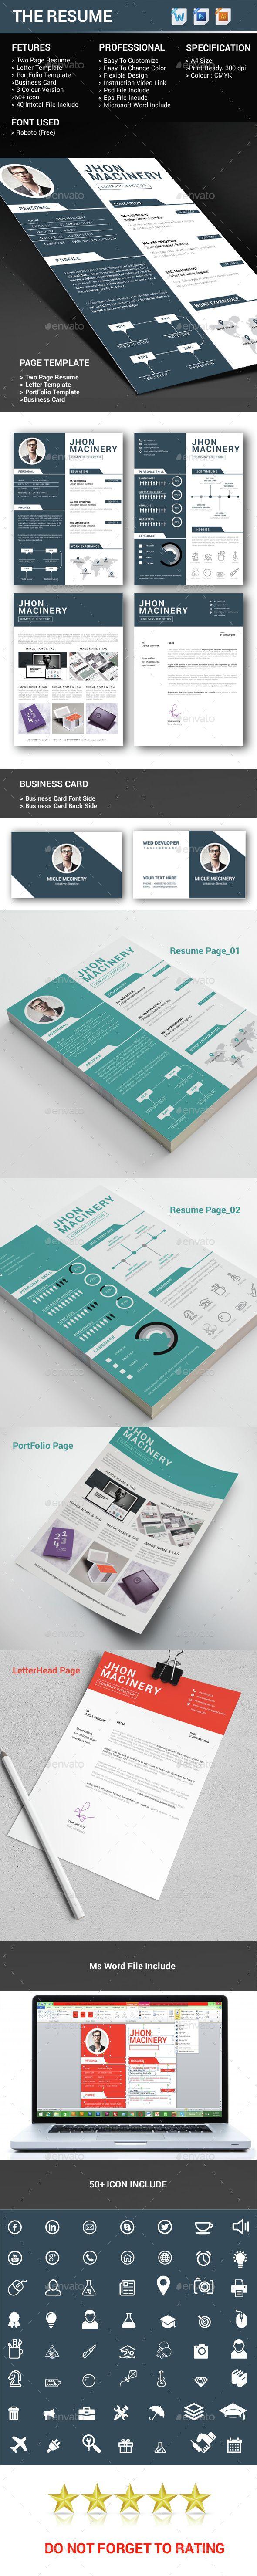 Resume / CV Template PSD, Vector EPS, AI. Download here: http://graphicriver.net/item/resumecv/14560862?ref=ksioks